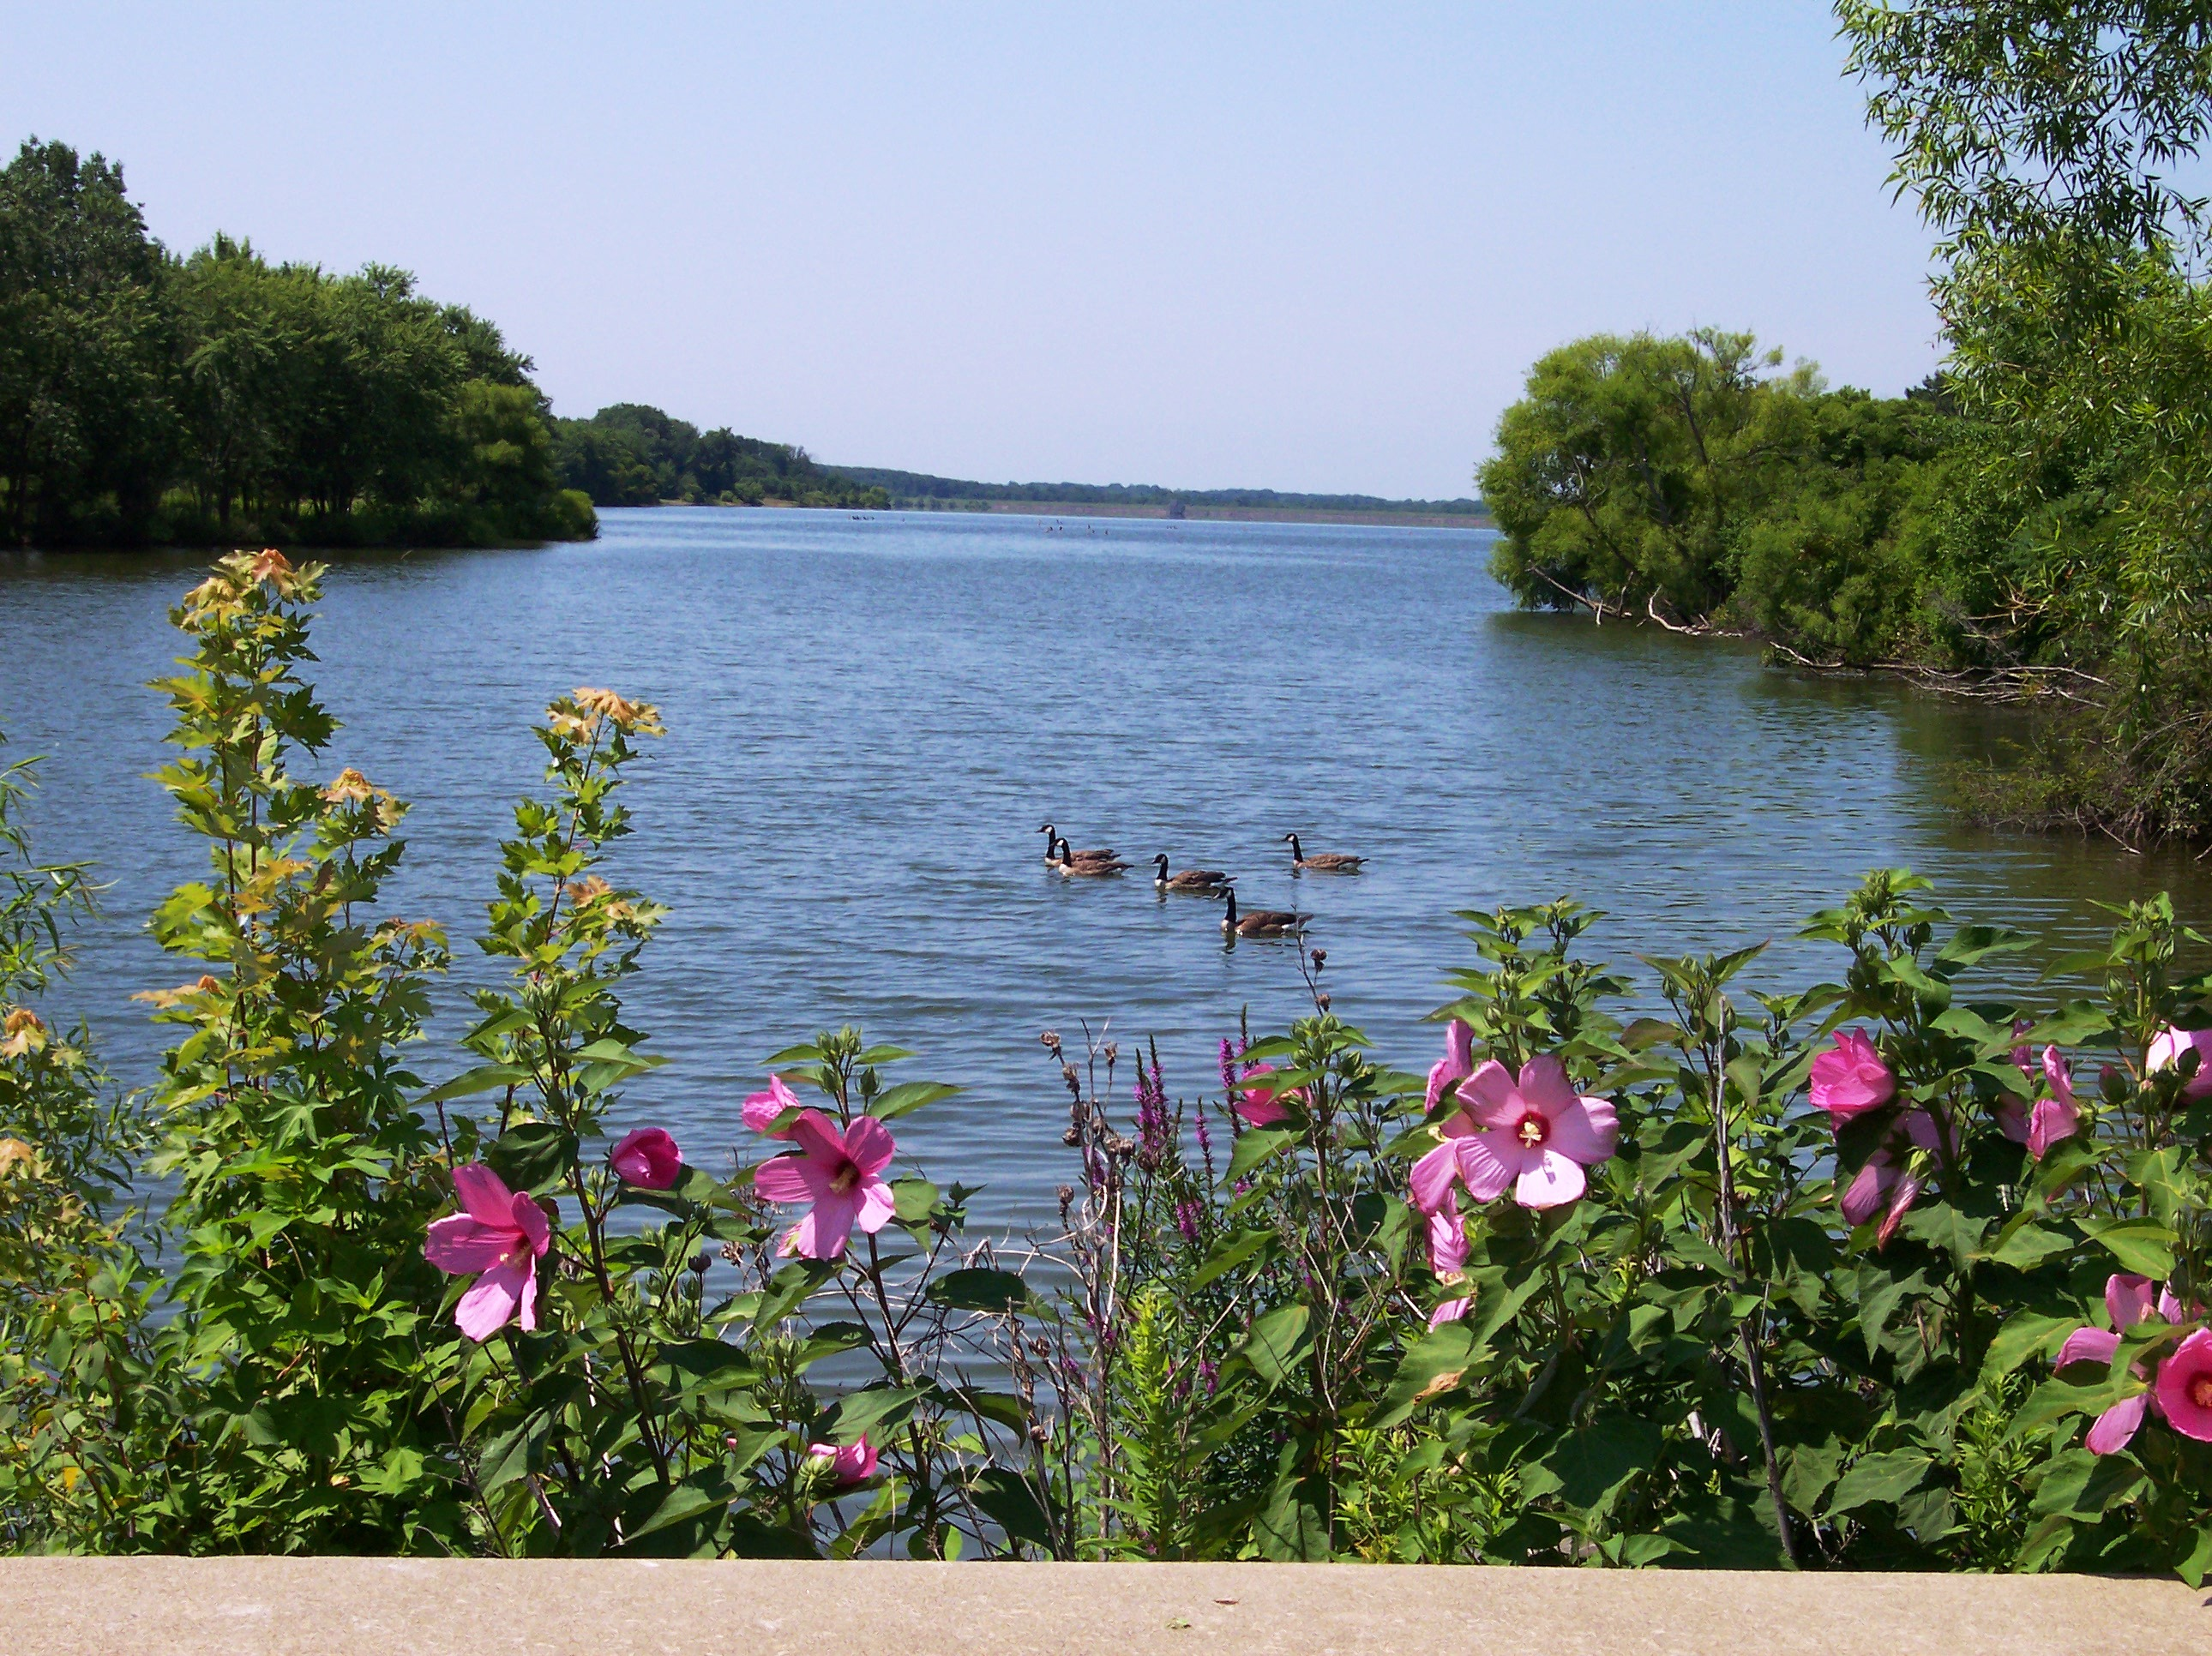 1465638252Best_pic_rose_mallow_lake_geese.jpg